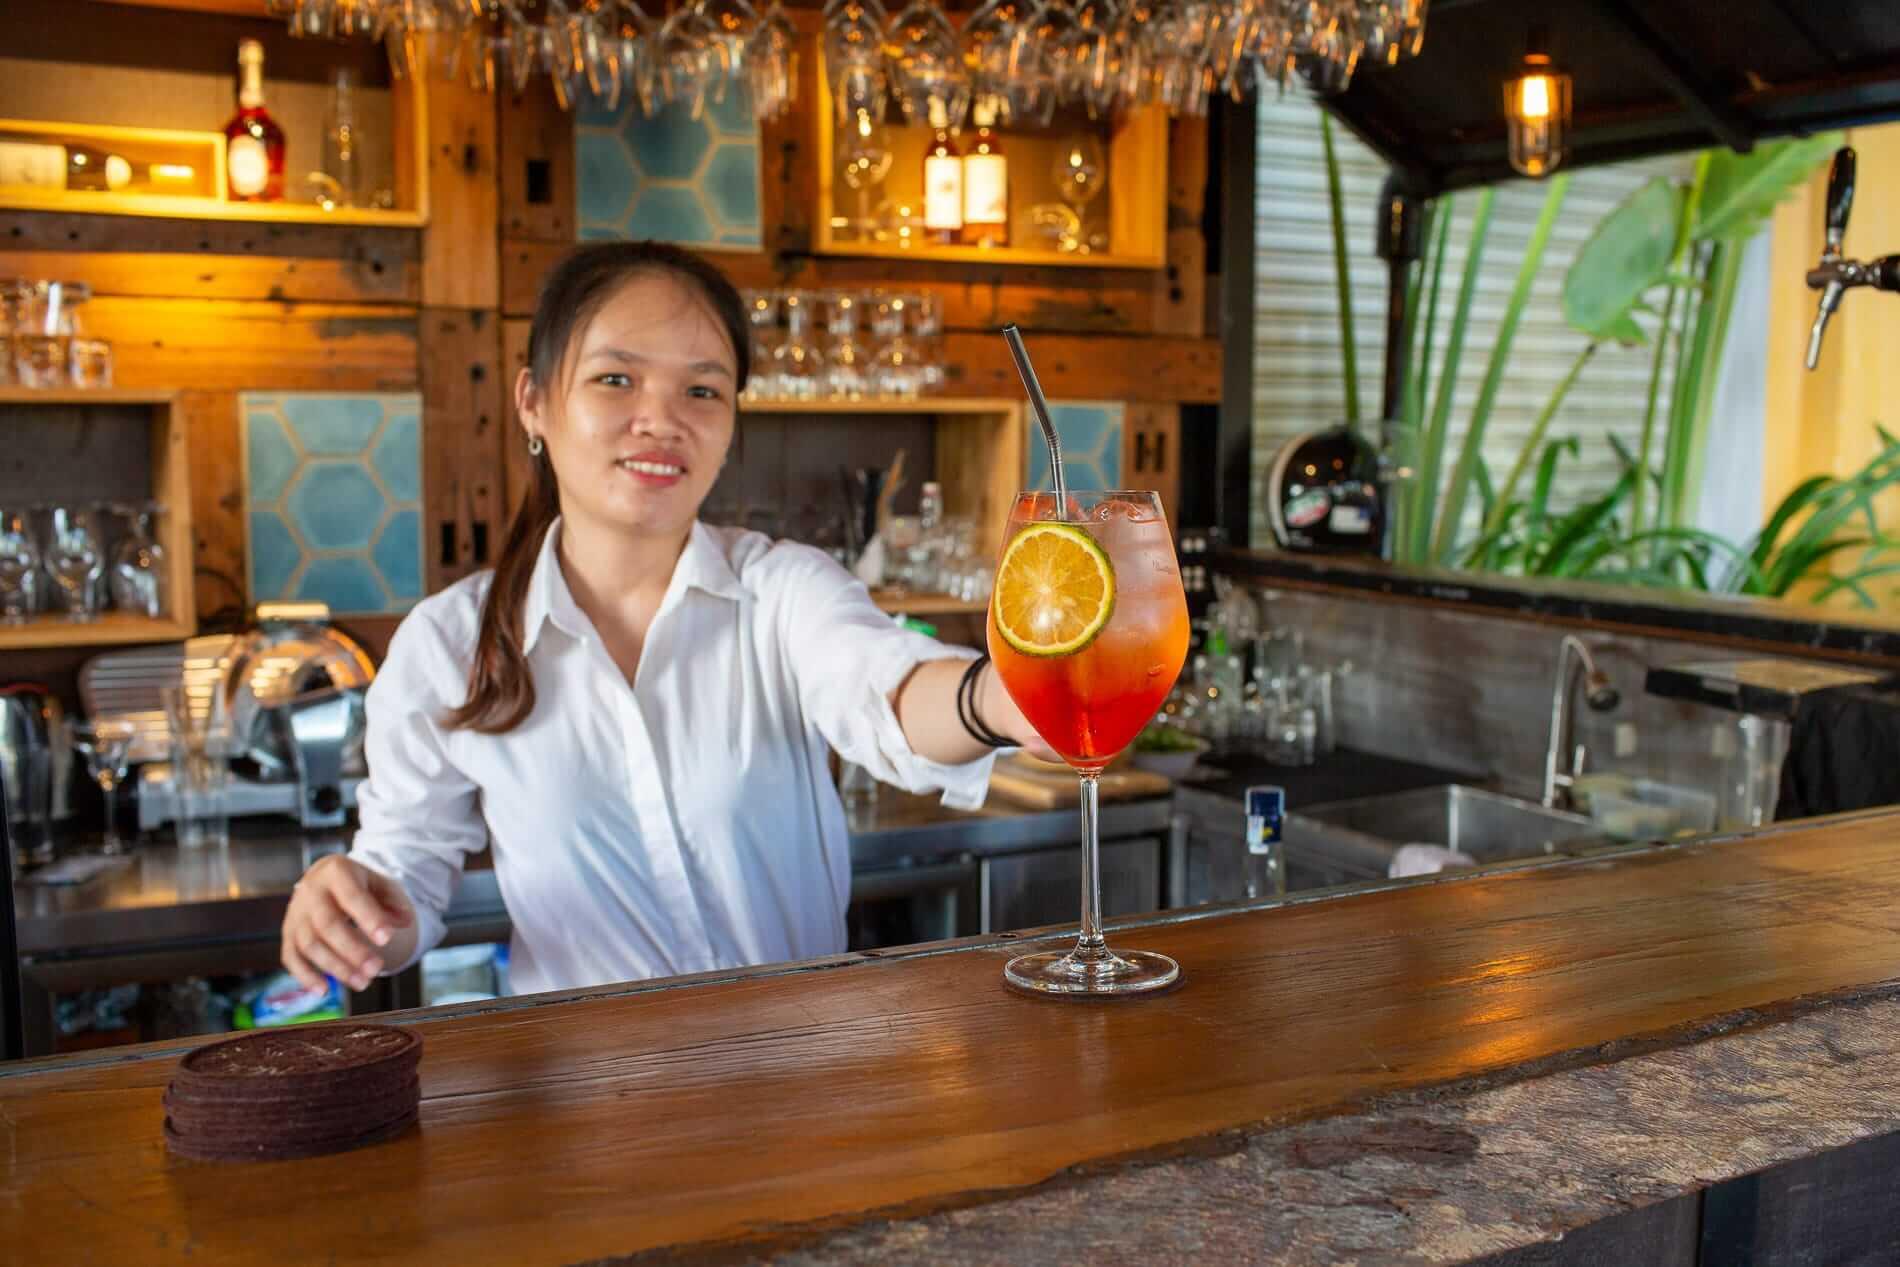 Find a peaceful oasis at Market Bar Hoi An